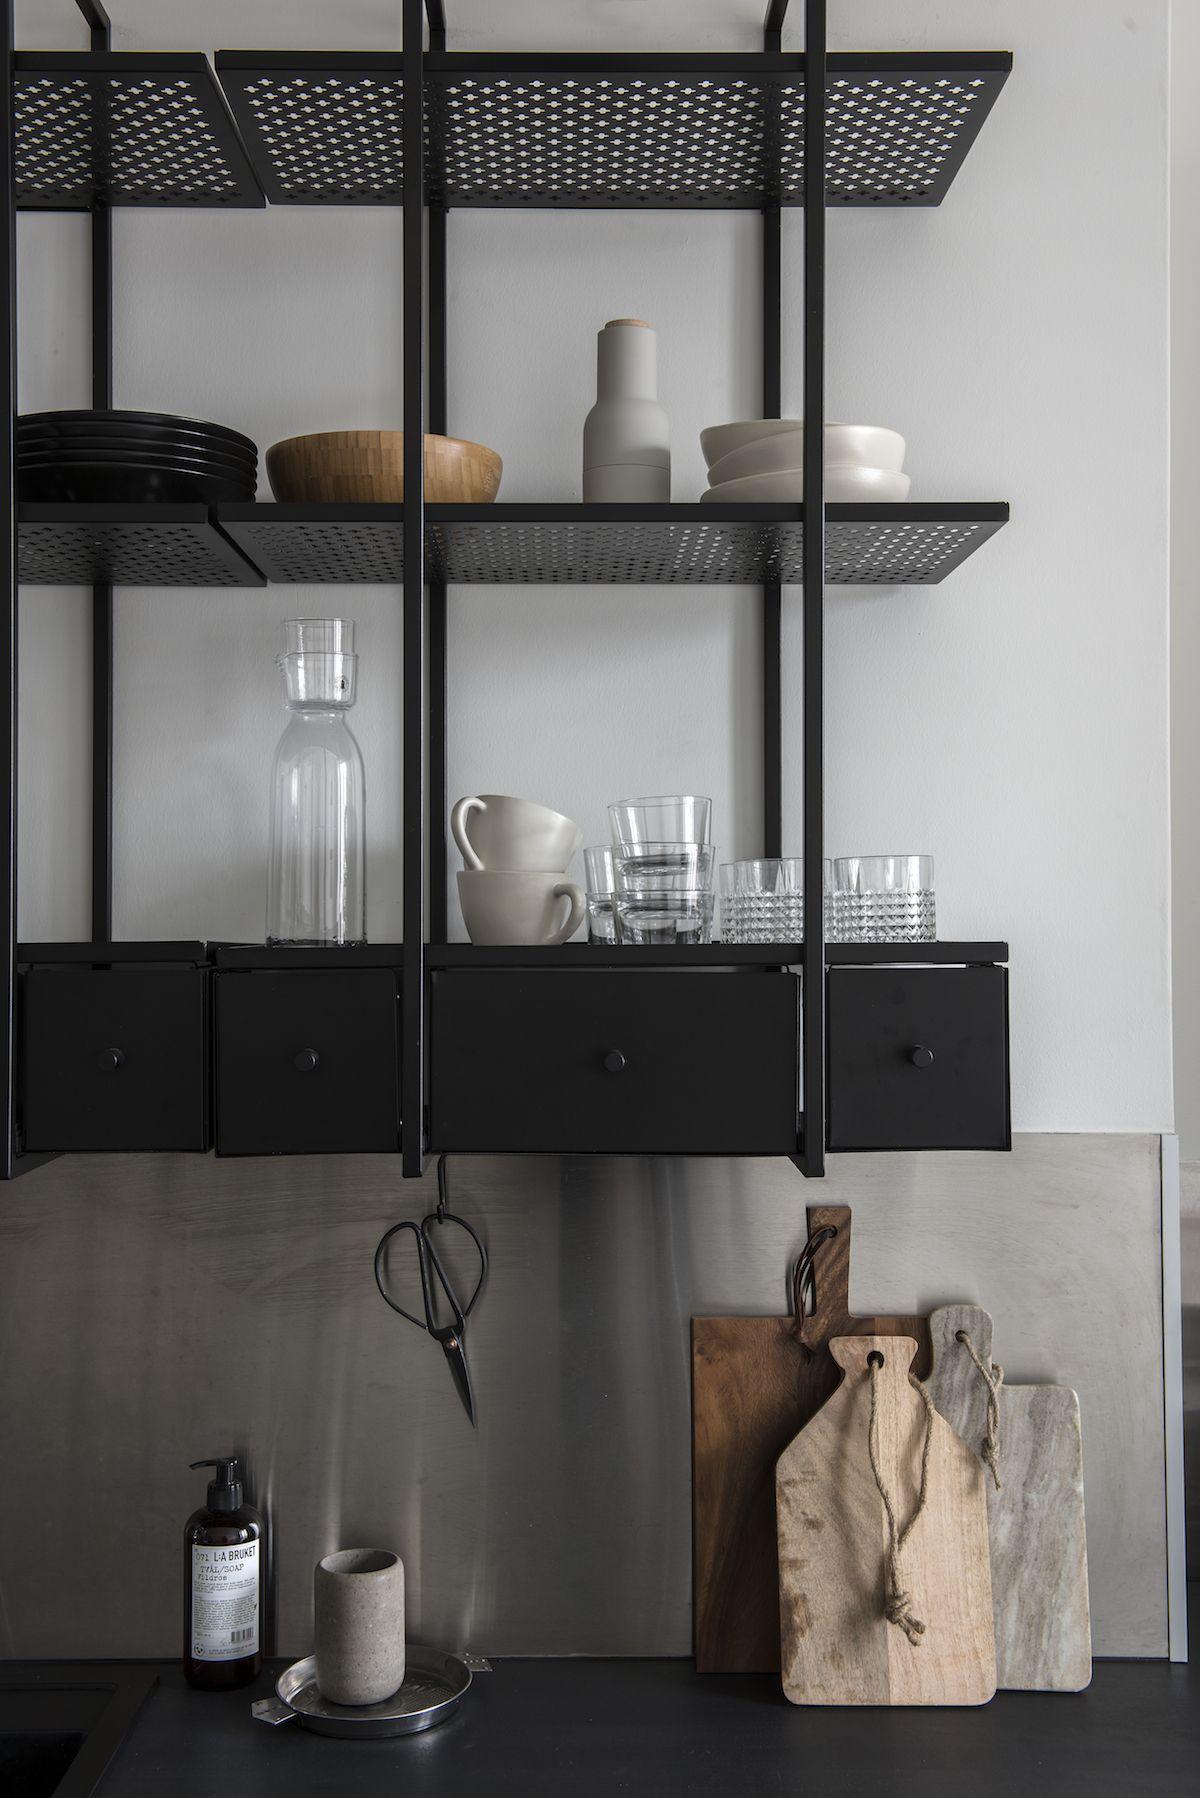 metal kitchen shelf flooring lowes beautiful helsinki home modern kitchens pinterest unusual black shelves in the open shelving storage styling via coco lapine design